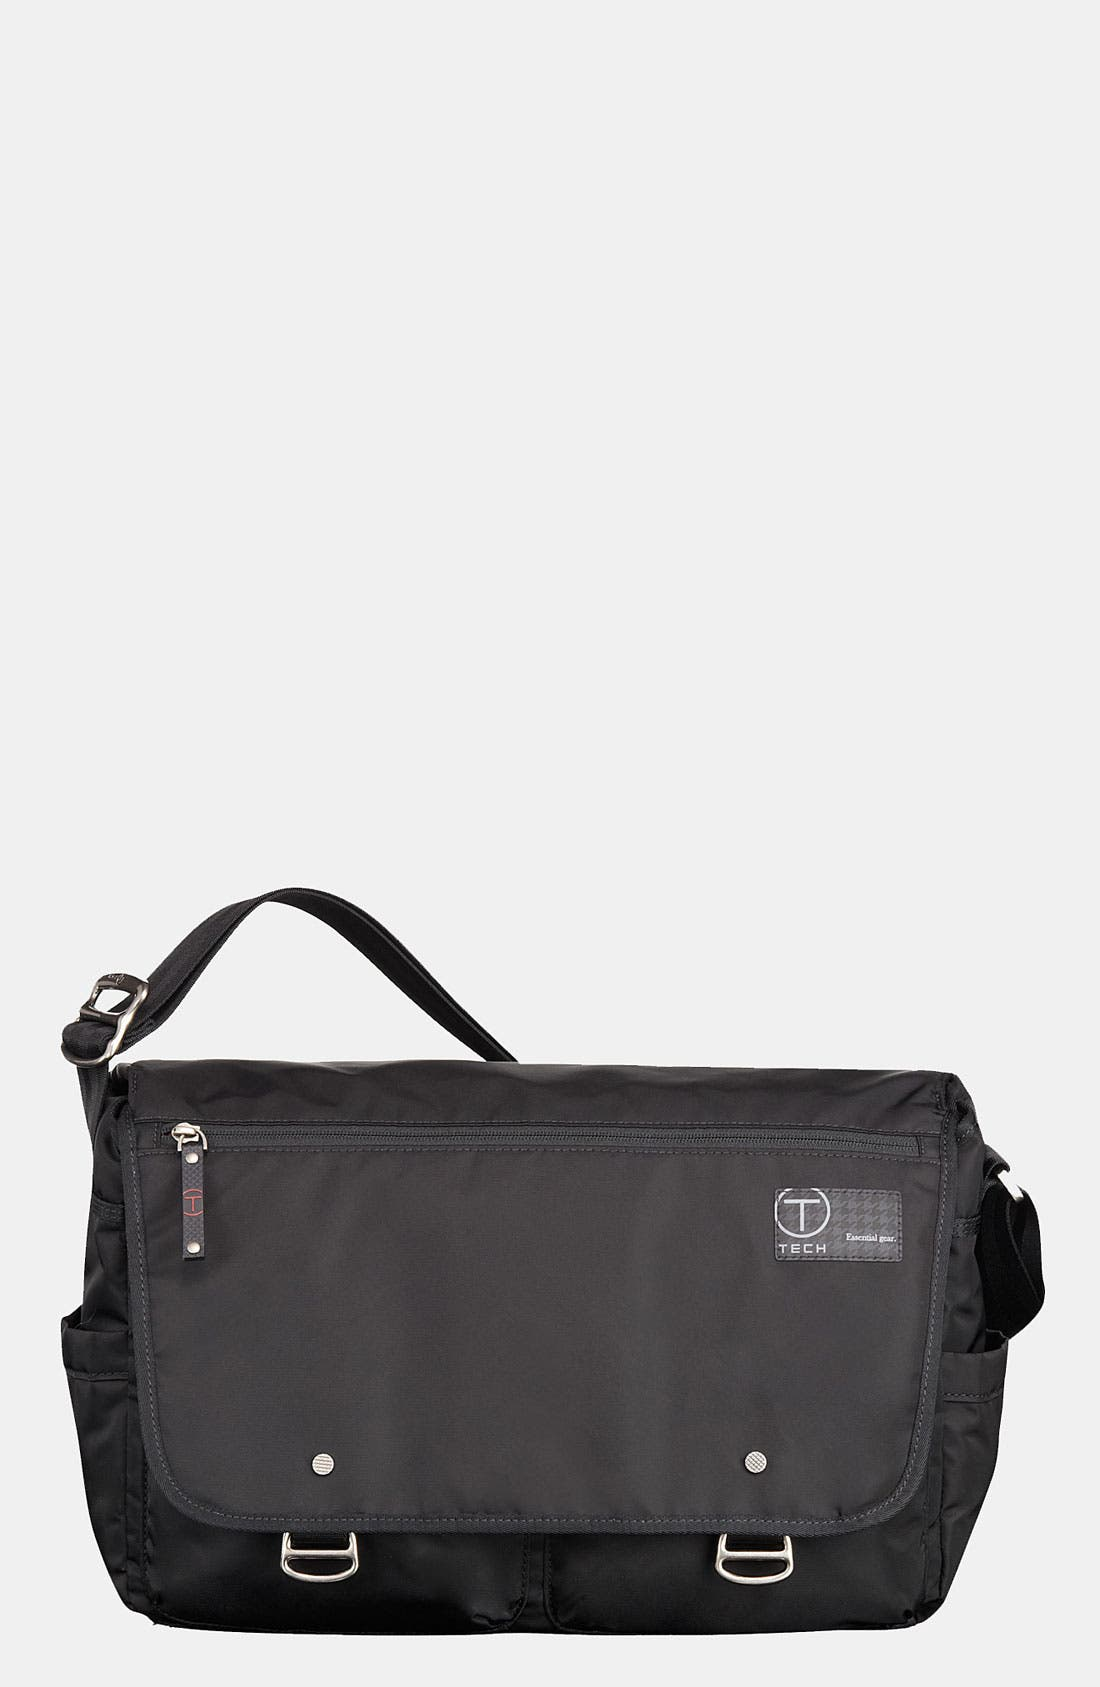 Alternate Image 1 Selected - Tumi 'T-Tech Icon - Hans' Laptop Messenger Bag